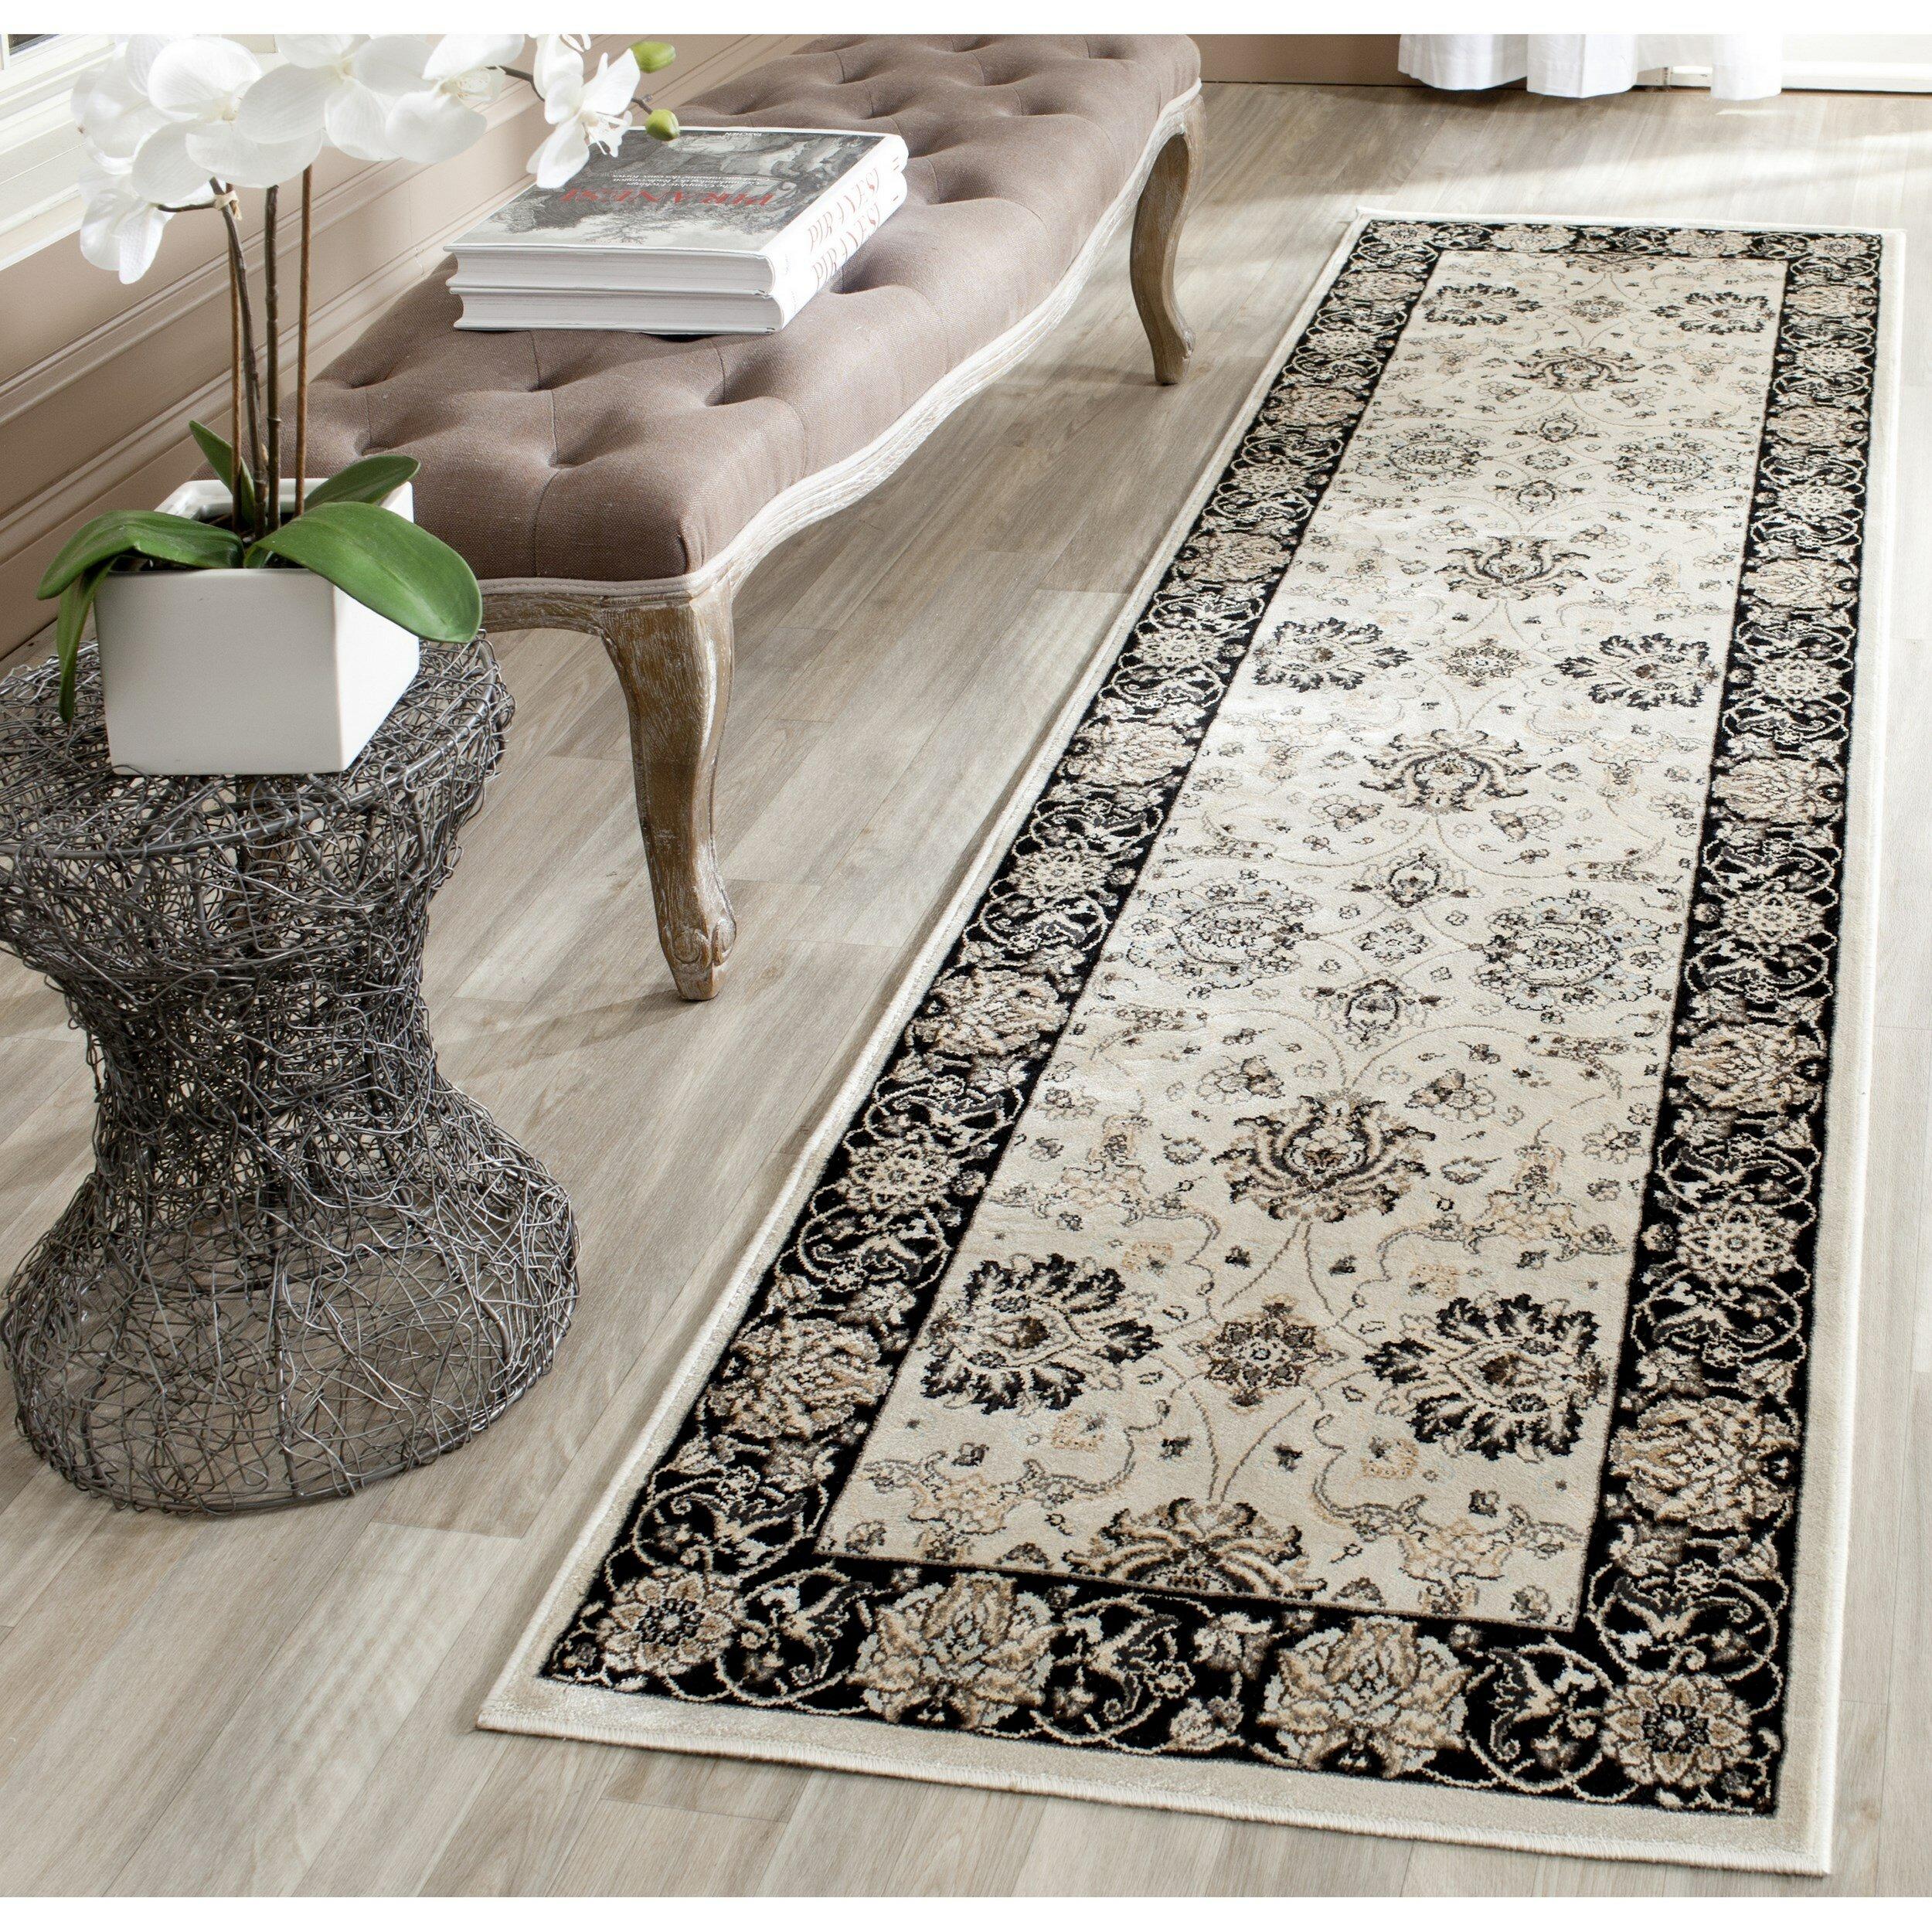 Area Rug Persian 9x12 Oriental Carpet Ivory Wool: Safavieh Persian Garden Ivory/Black Area Rug & Reviews